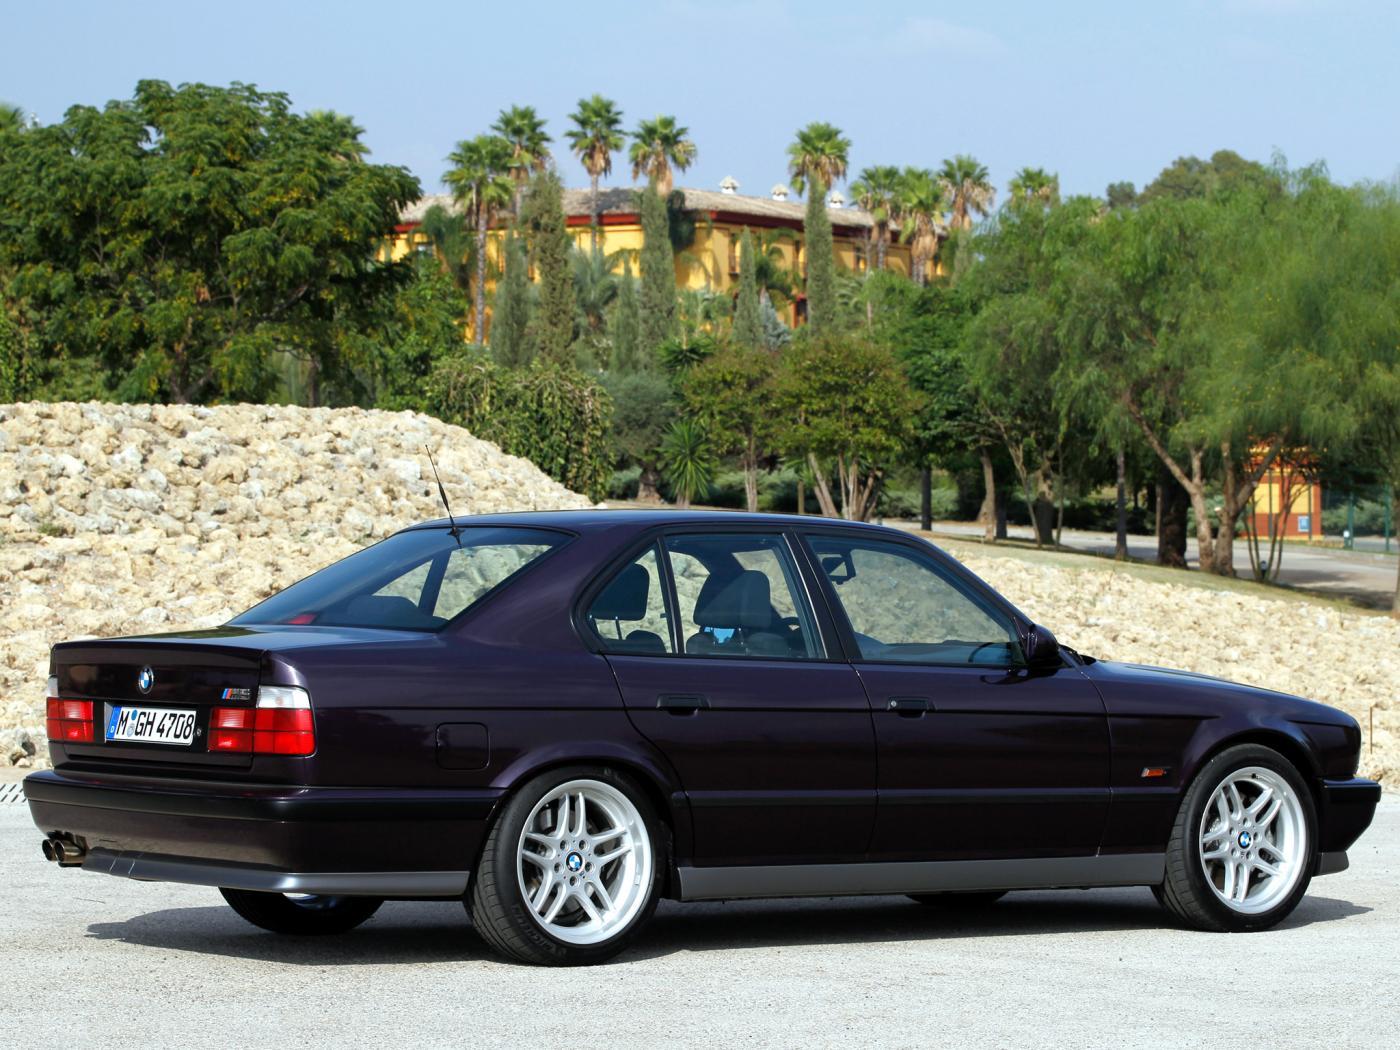 BMW-M5-E34_20170705-2306.jpeg